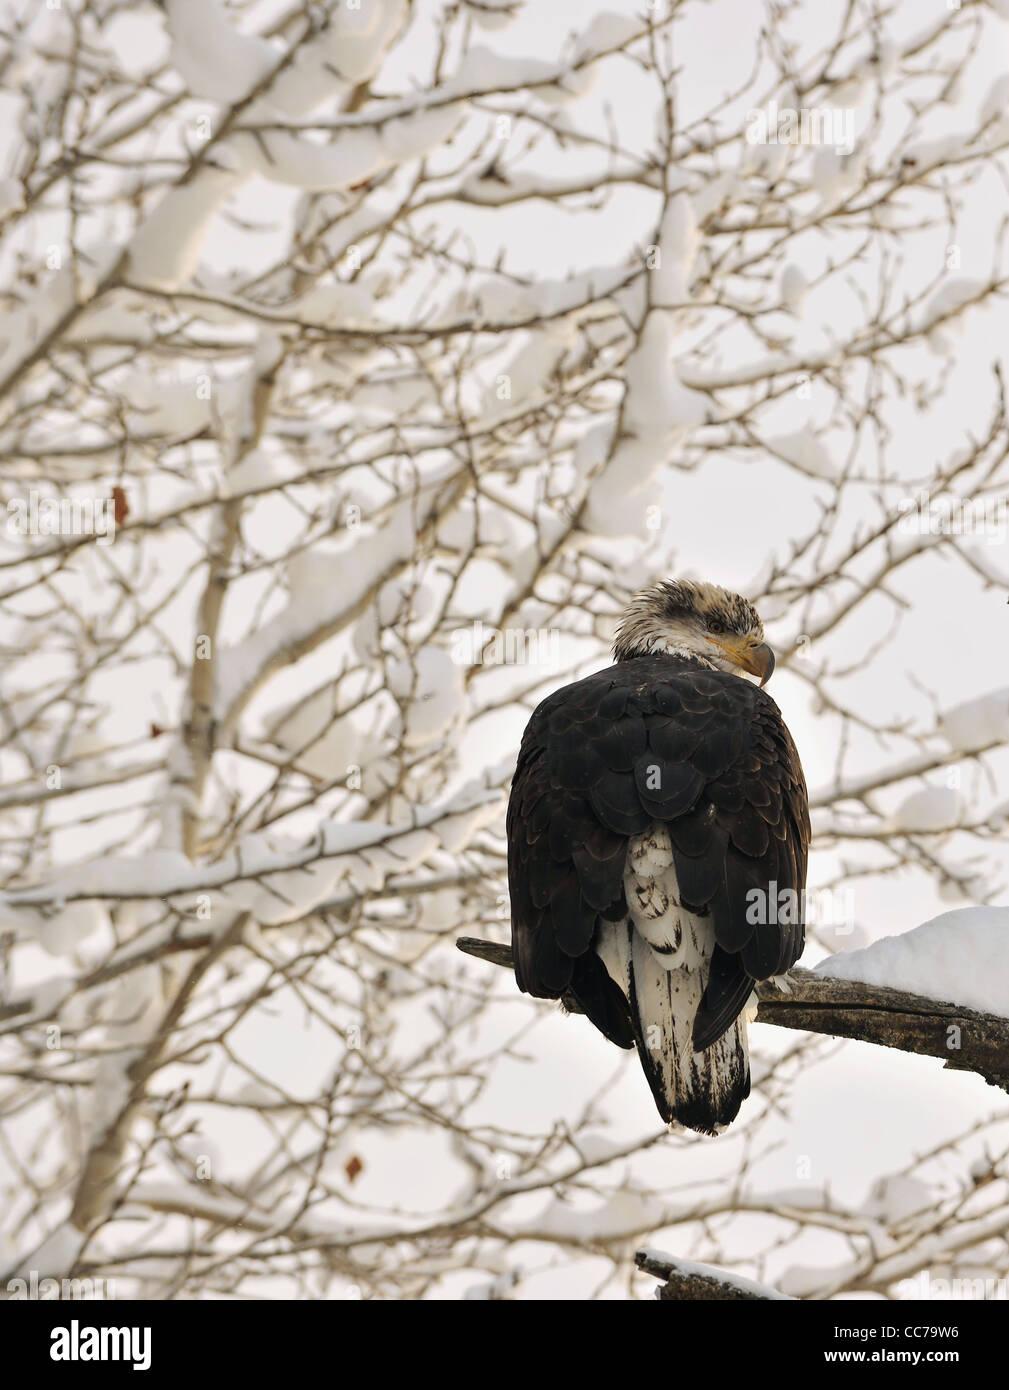 Portrait of an eagle of a dead tree sitting on a branch. Haliaeetus leucocephalus washingtoniensis. - Stock Image